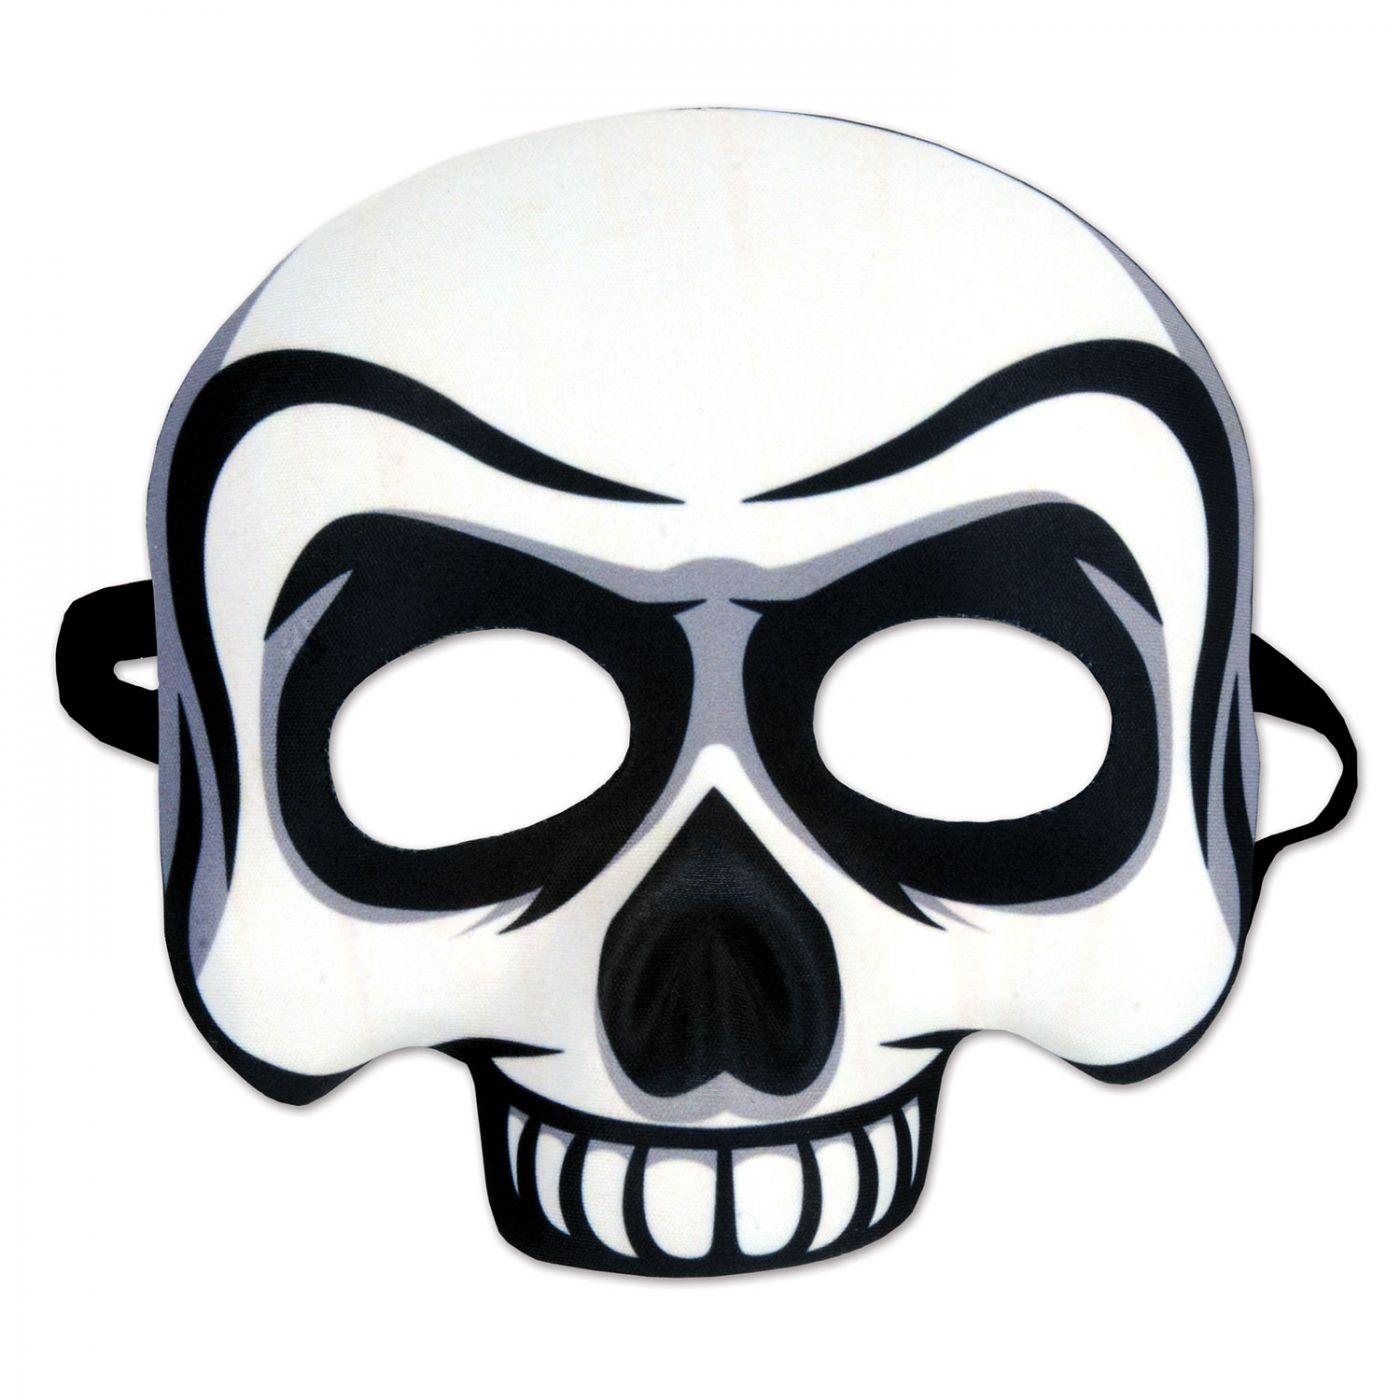 Skull Half Mask (6) image